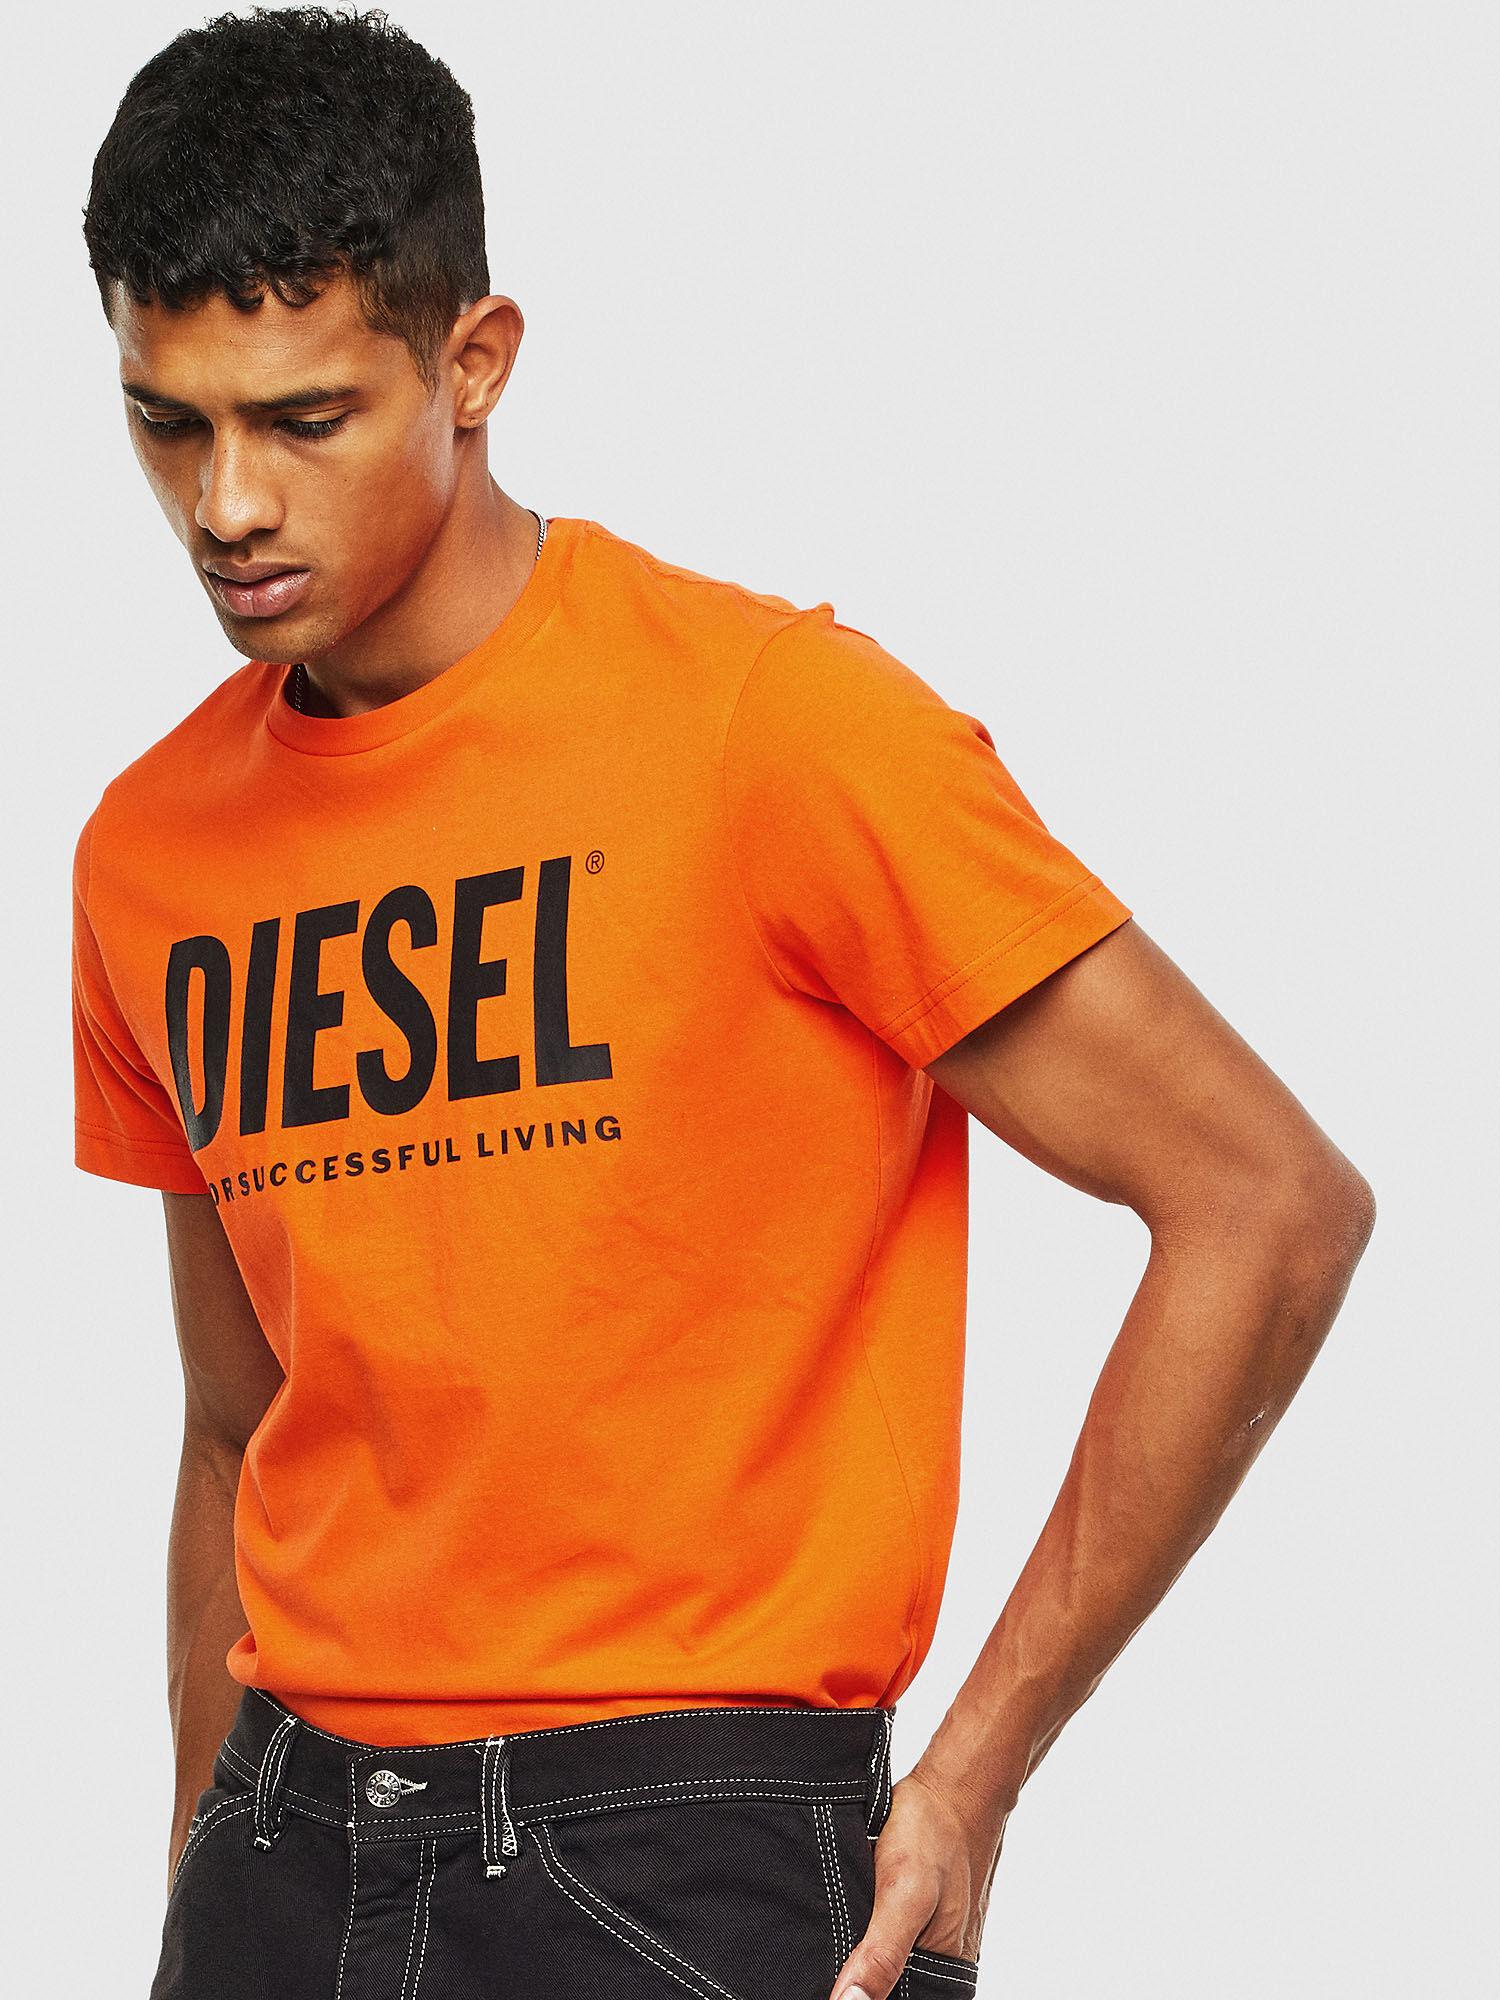 81E Diesel S-Crew-Division Sweatshirt Men Mens Jumper Sweater 00 Shep 0 catk